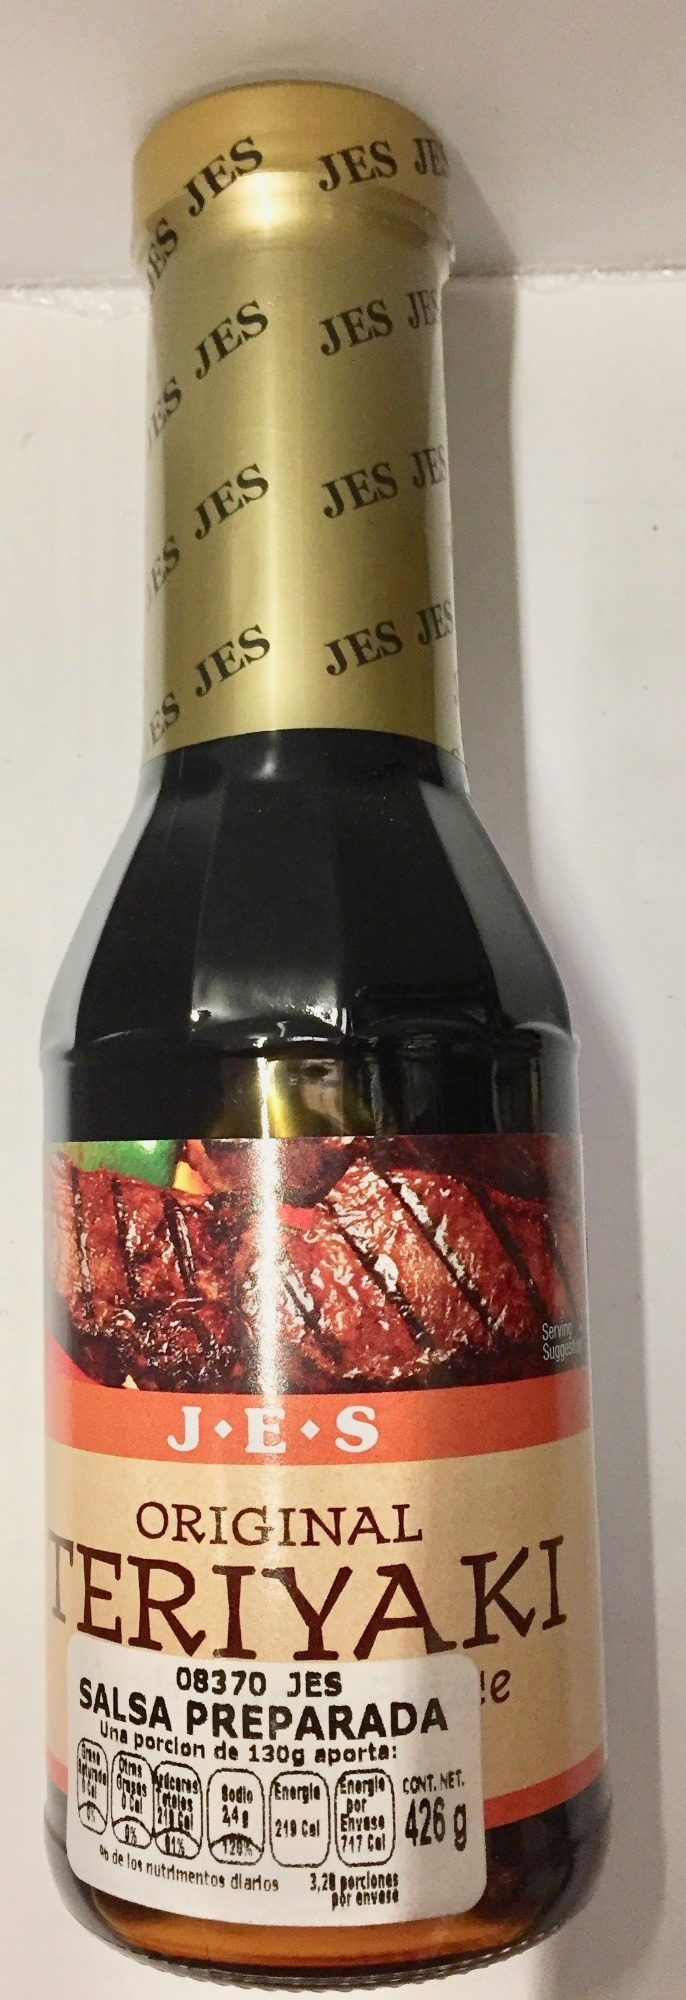 Original teriyaki sauce and marinade - Producto - es